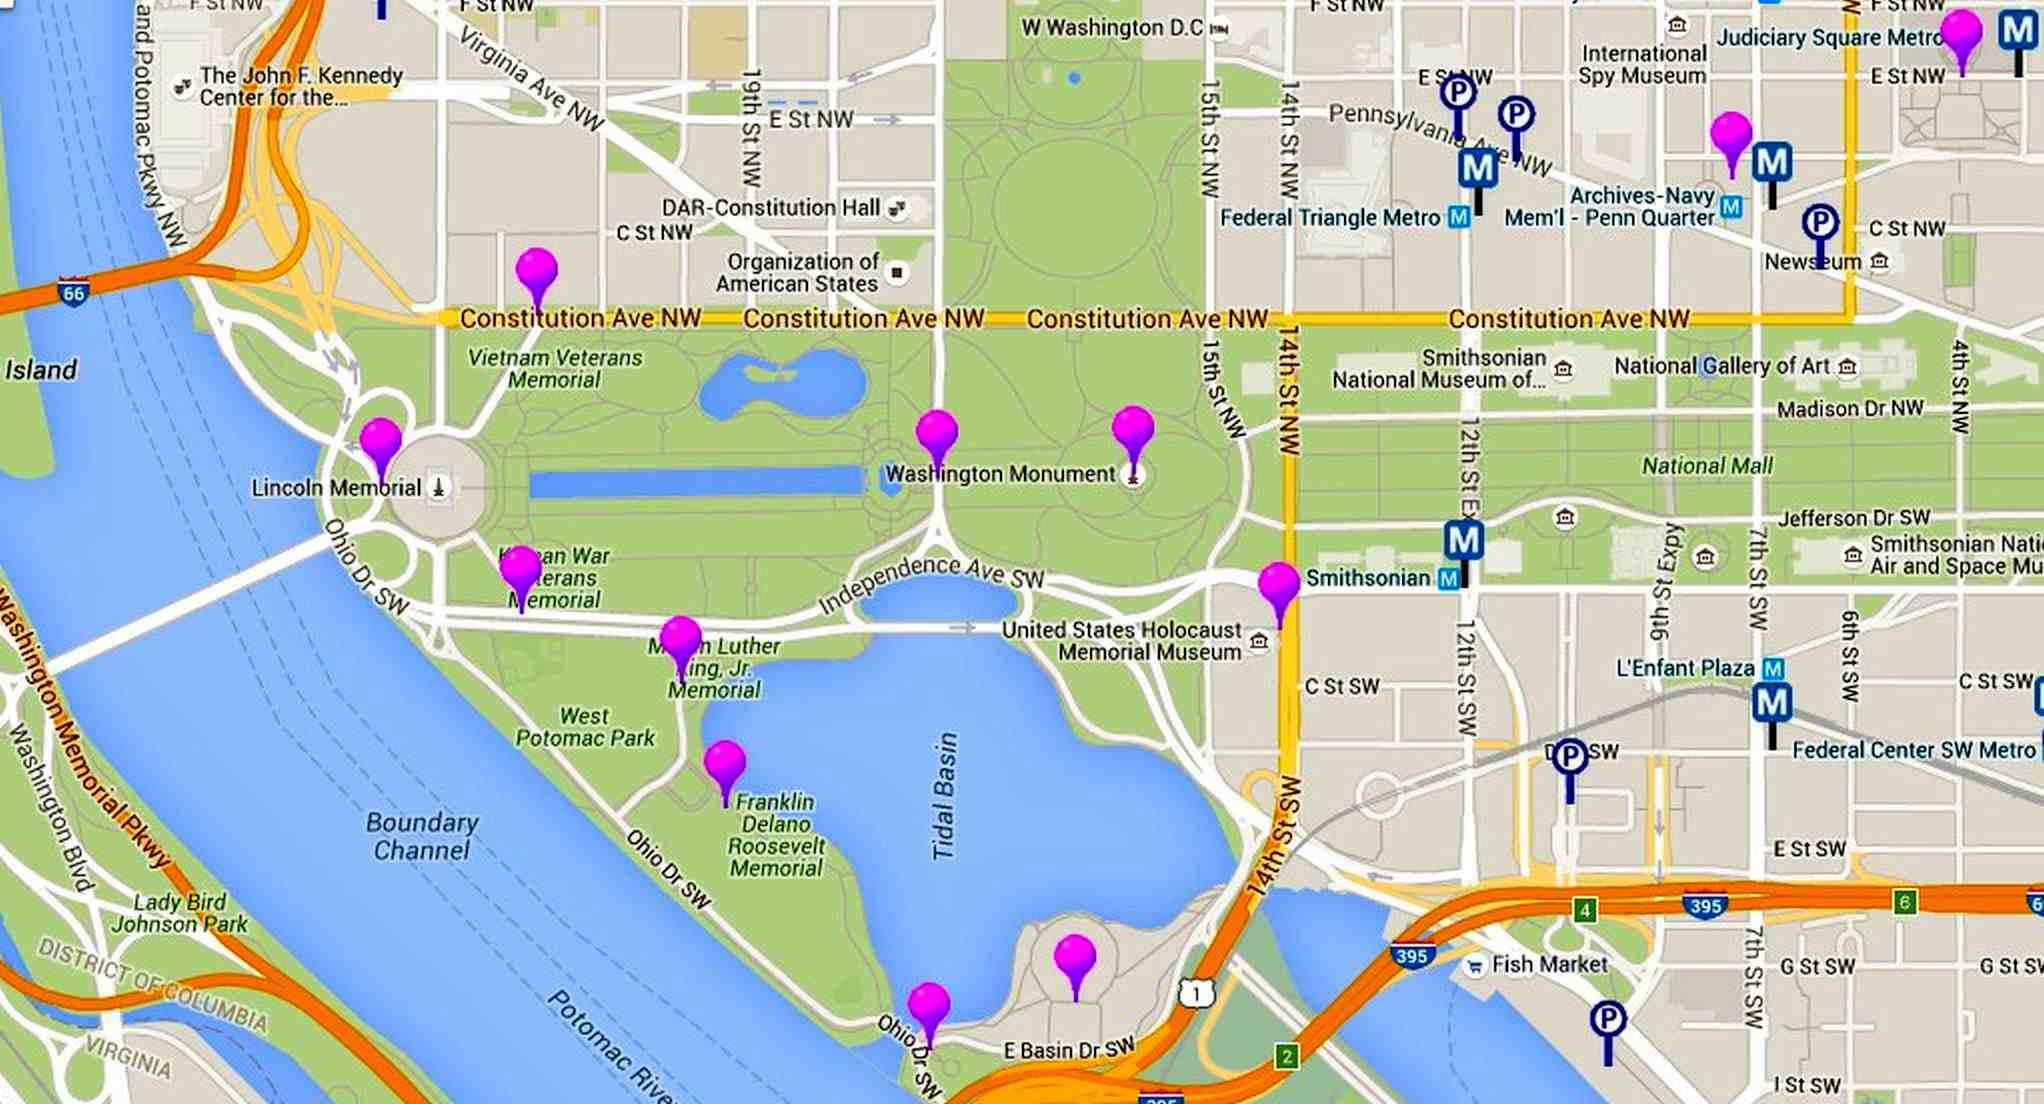 Cherry Blossoms Maps for Washington, DC